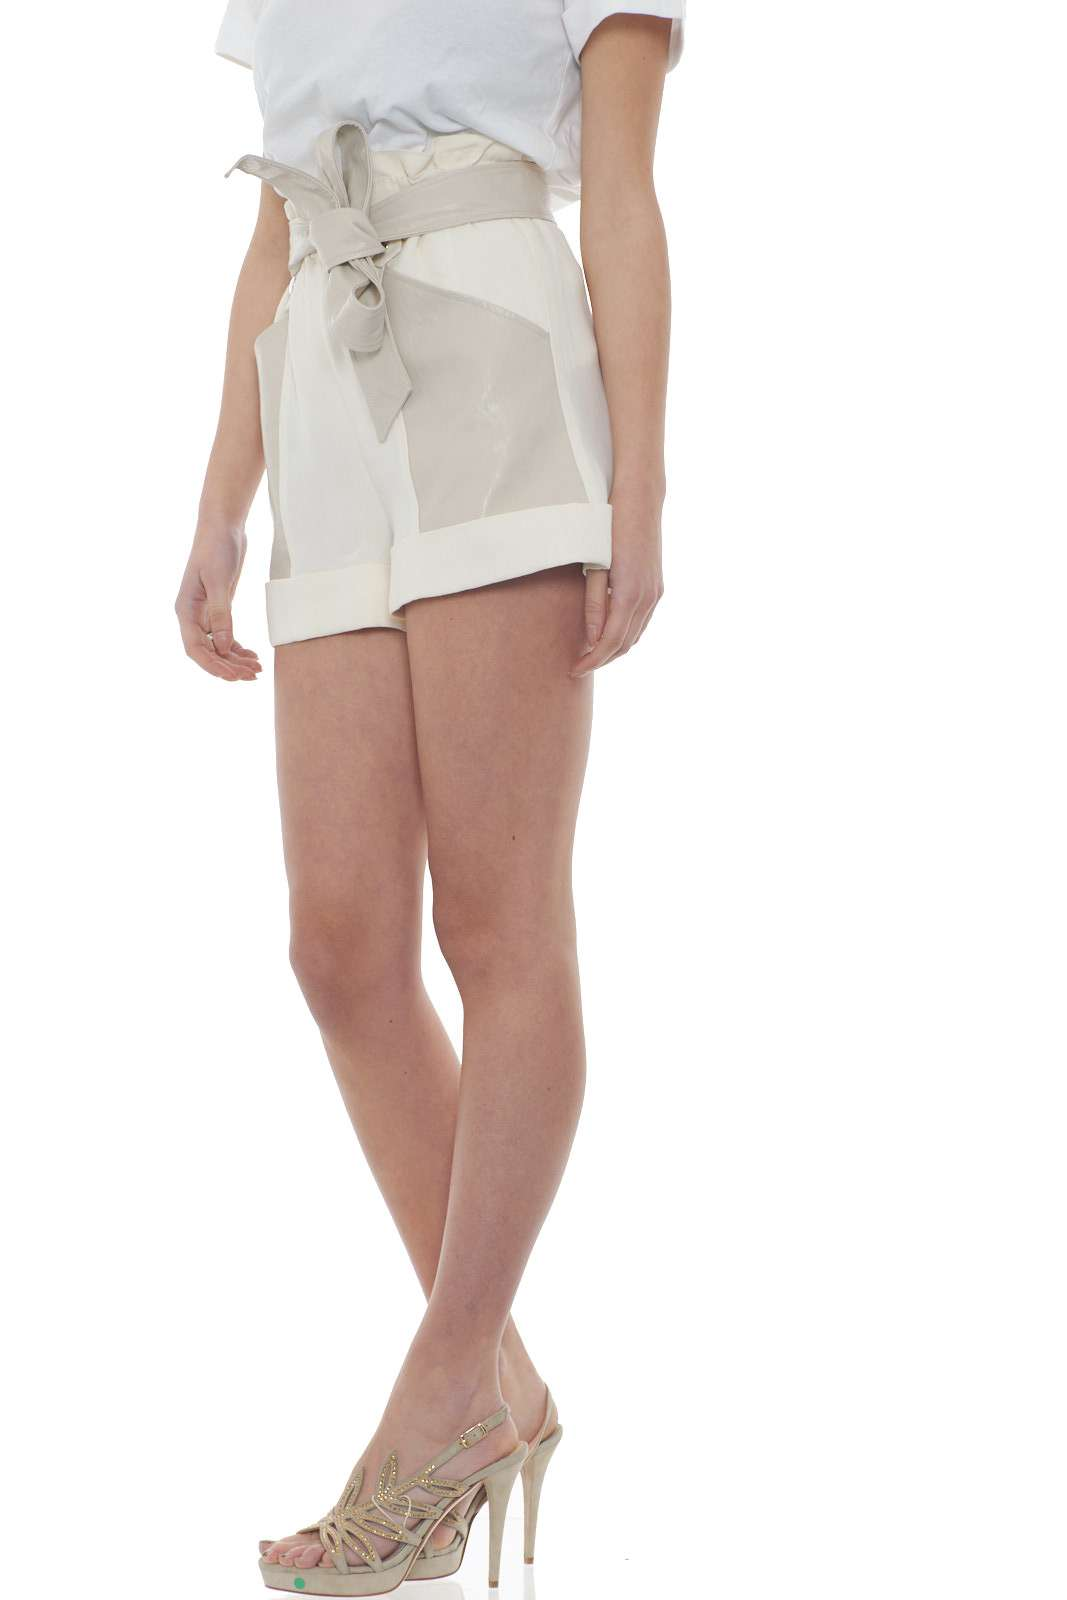 https://www.parmax.com/media/catalog/product/a/i/PE-outlet_parmax-shorts-donna-TwinSet-201TT2213-B.jpg